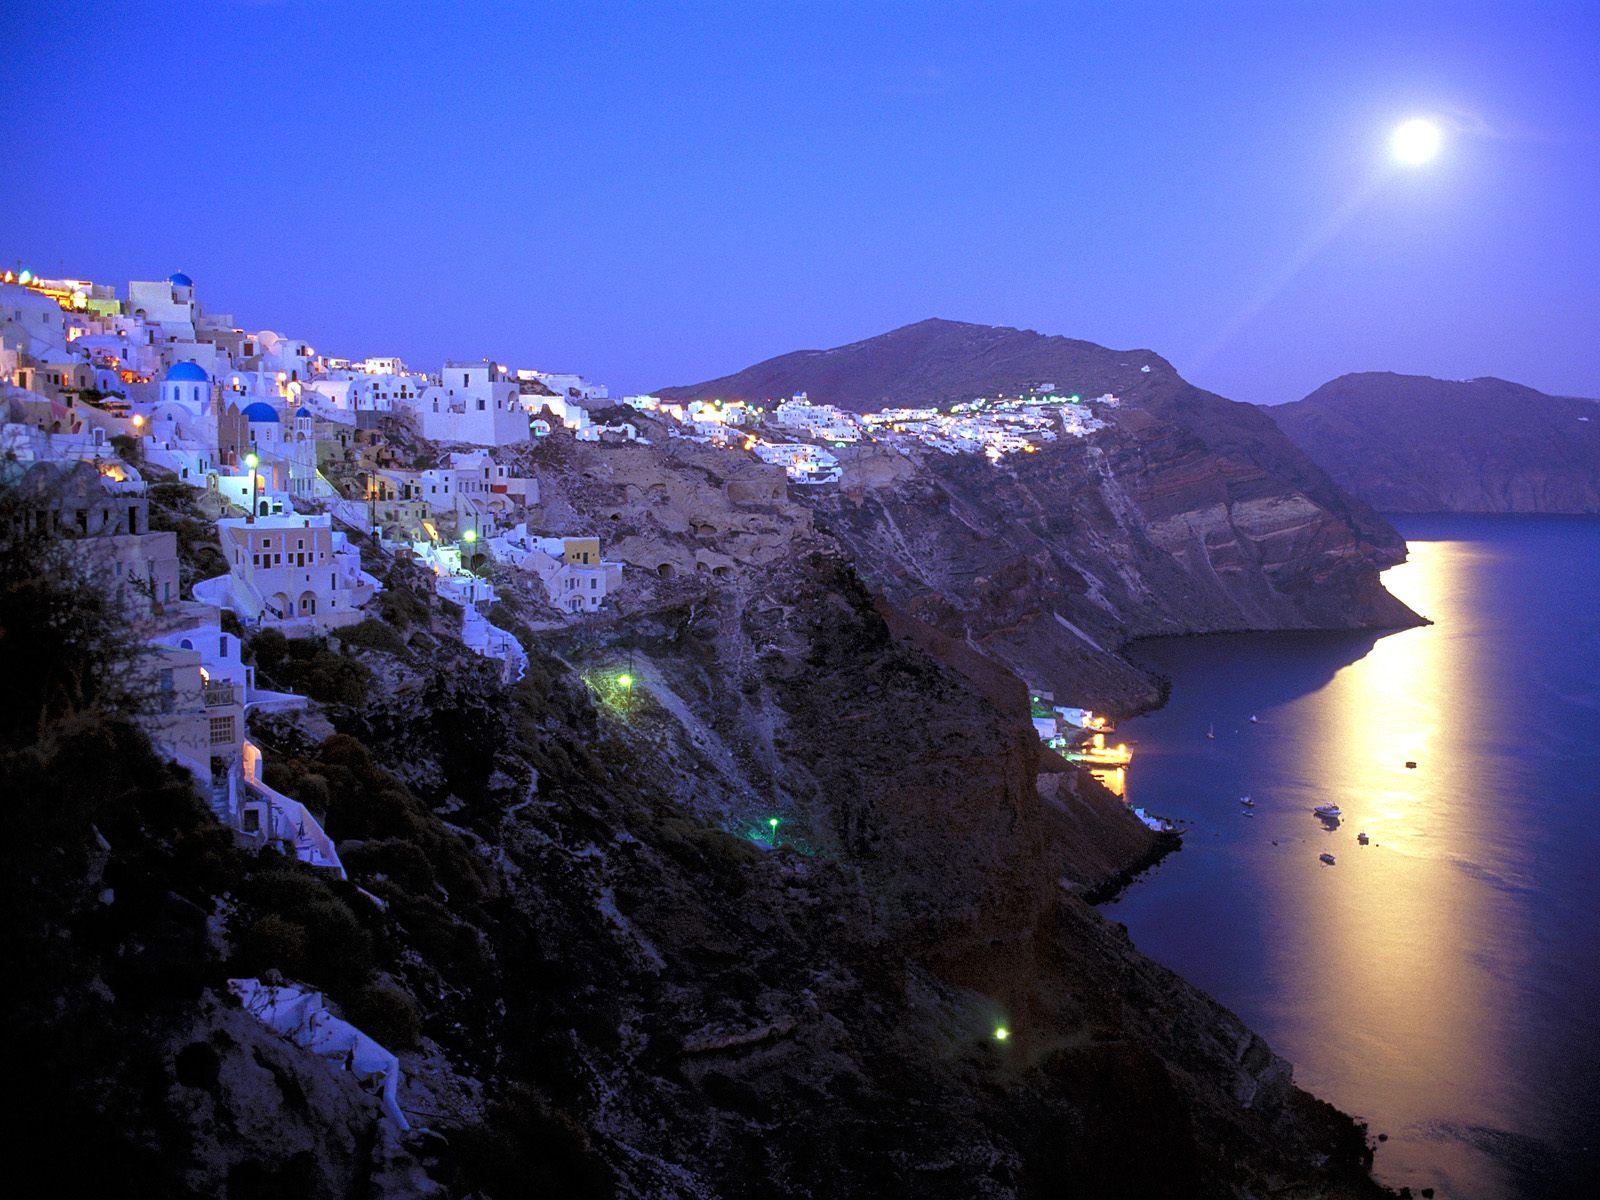 http://4.bp.blogspot.com/-vr9Bx_VHW3U/TiWpch5XvEI/AAAAAAAAB3w/hbhz_SbAuvw/s1600/Moonrise_Over_Santorini_Greece.jpg